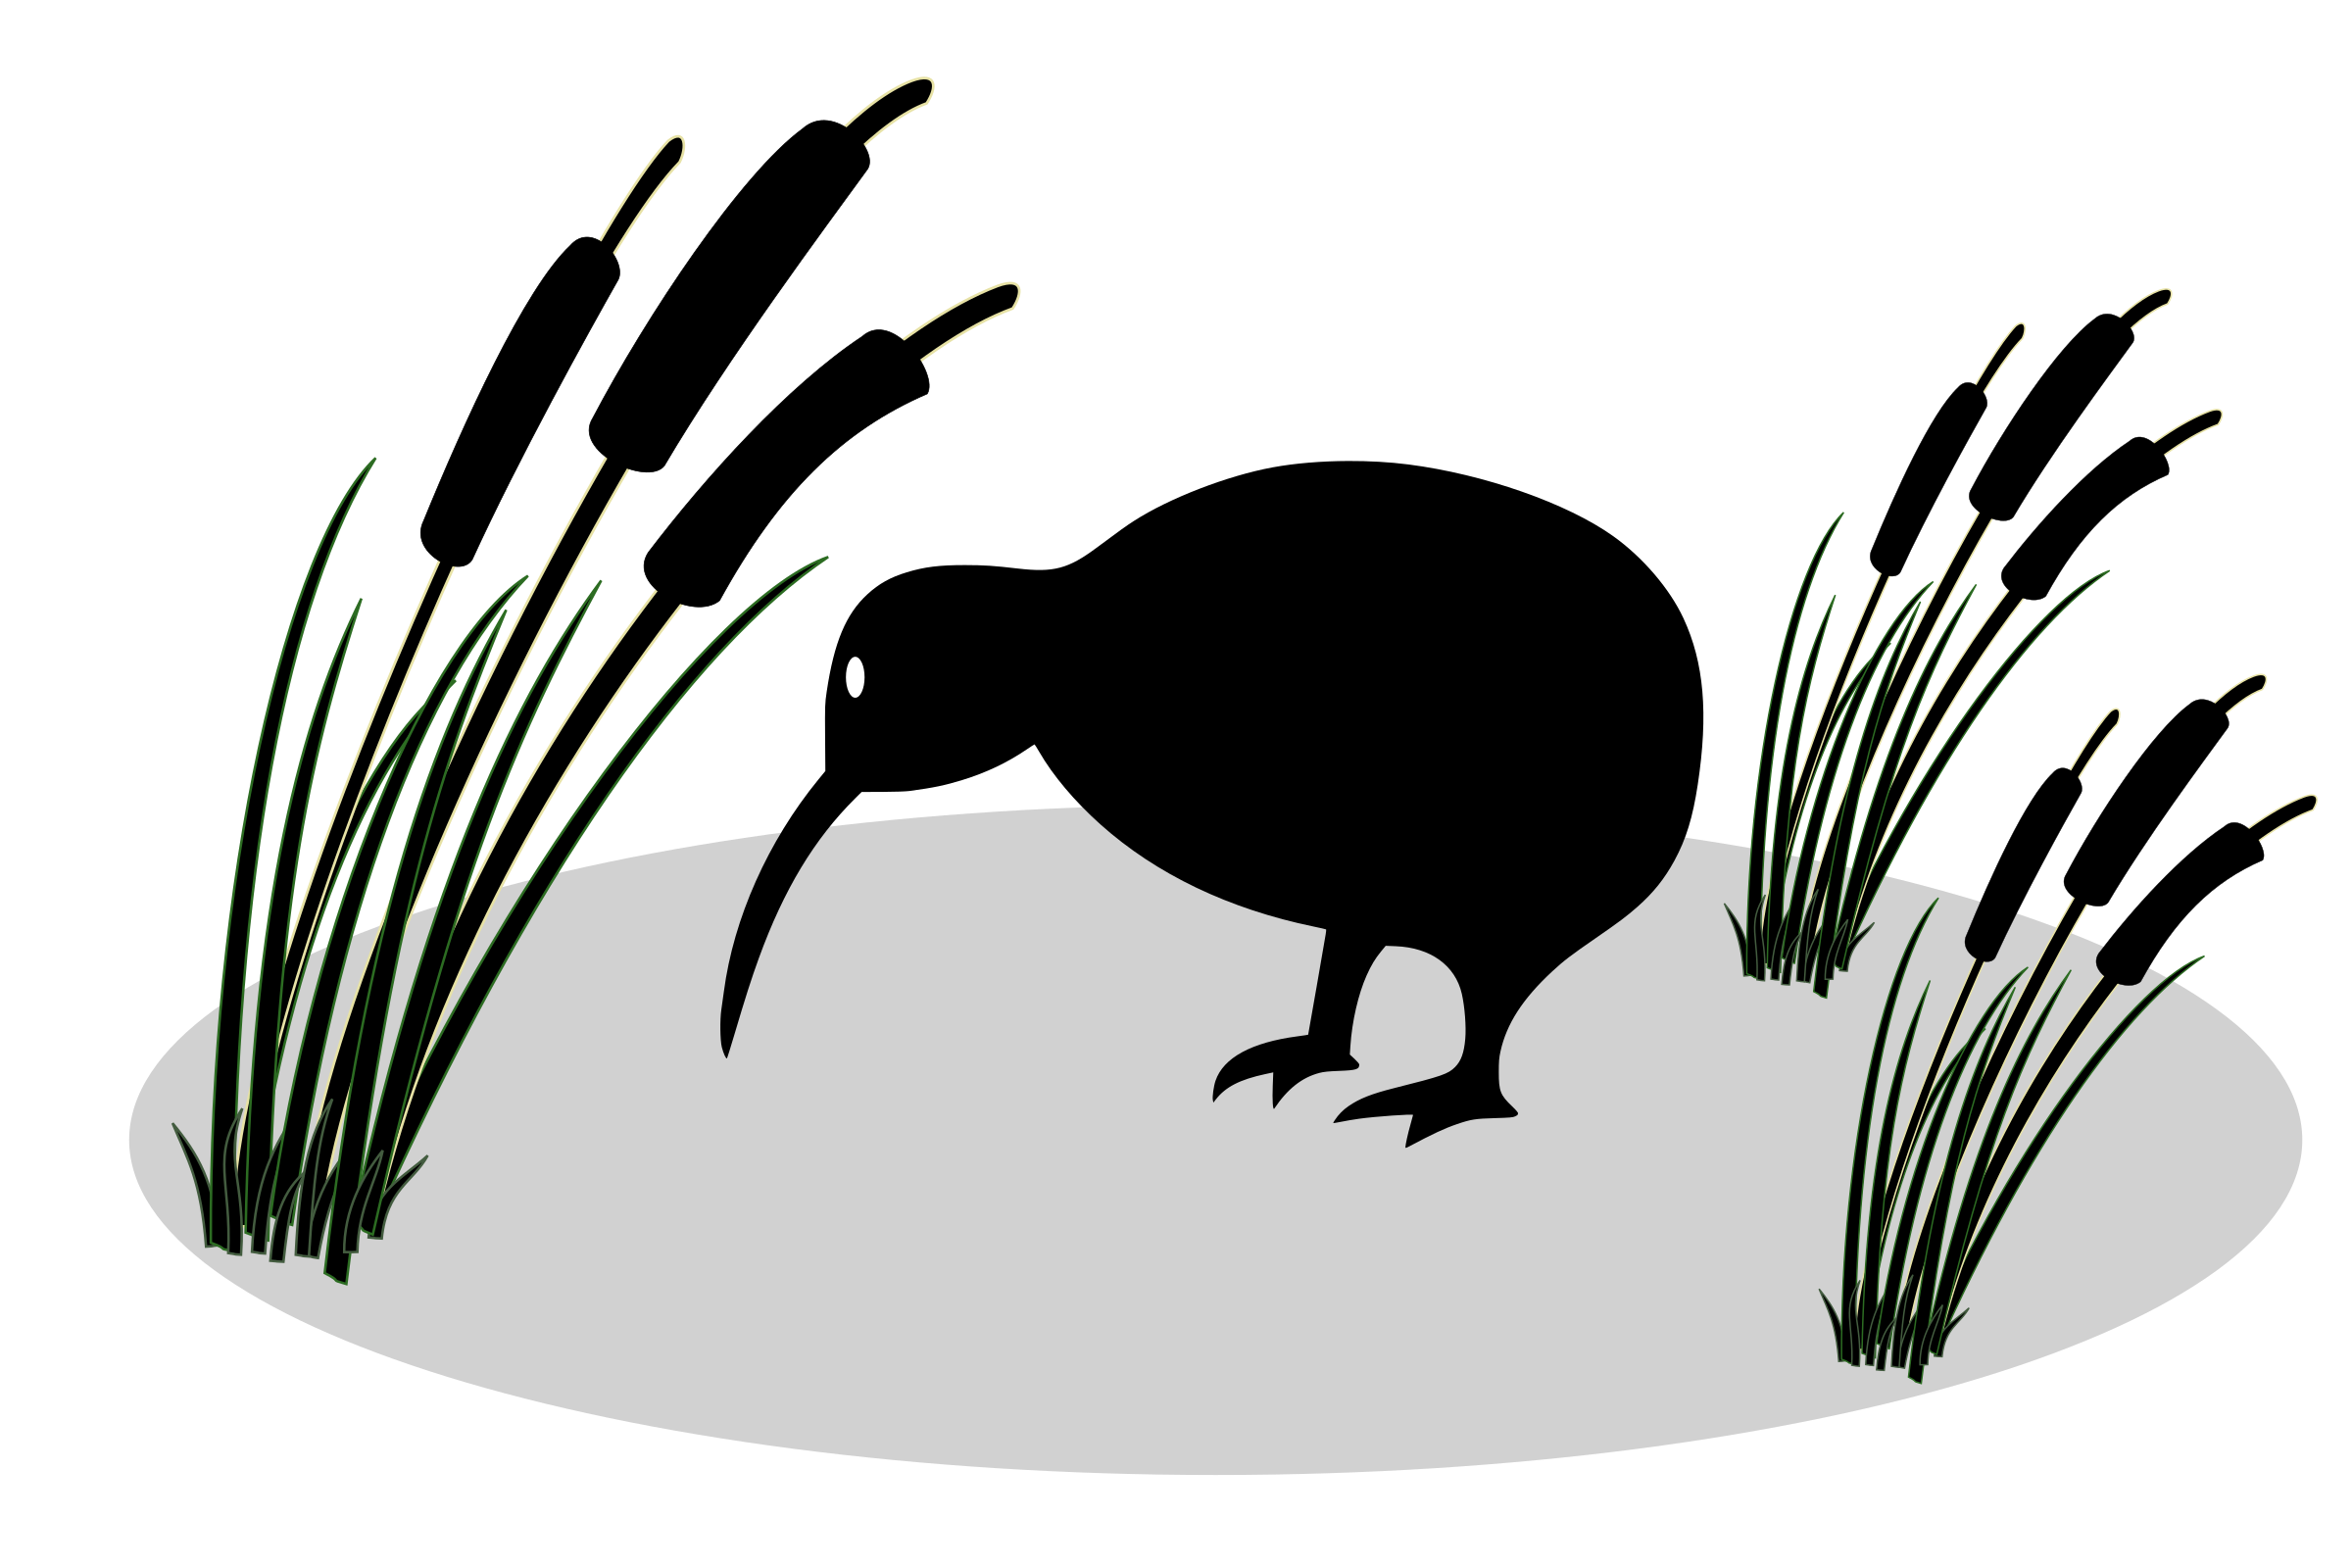 And reed big image. Clipart birds kiwi